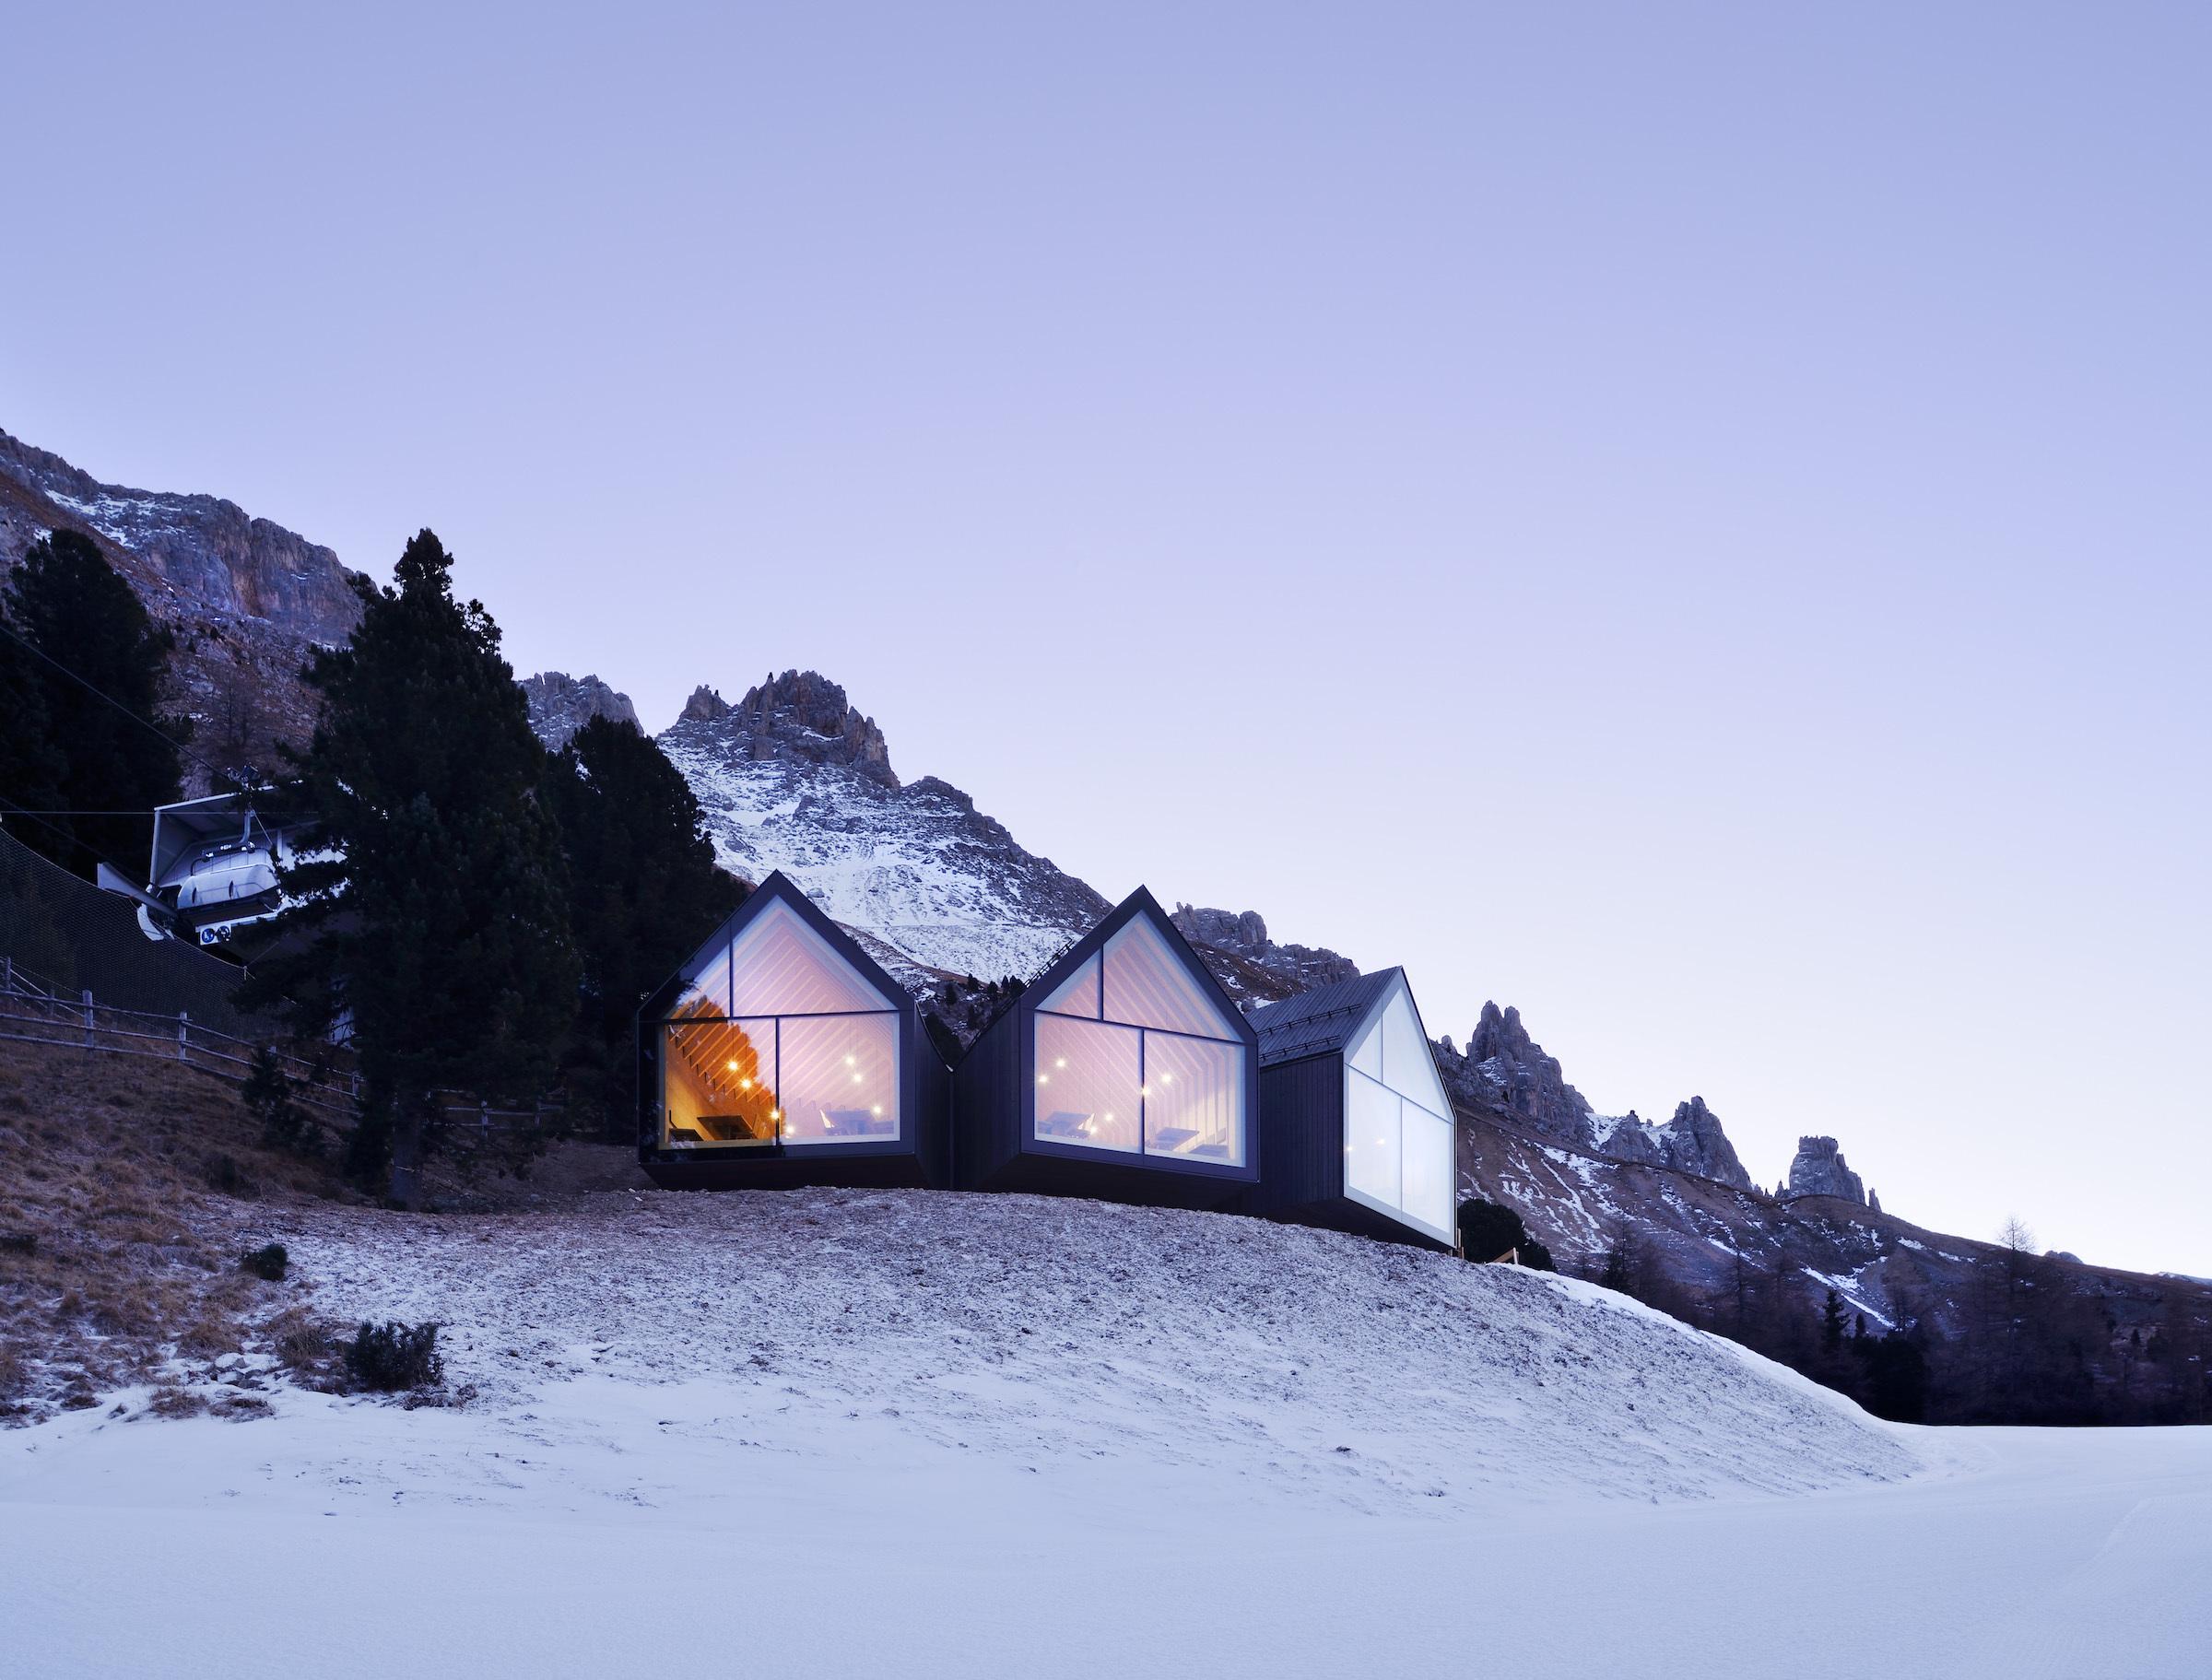 Oberholz Hütte: Modern Ski Lodge In The Italian Alps By Mikolajcak And